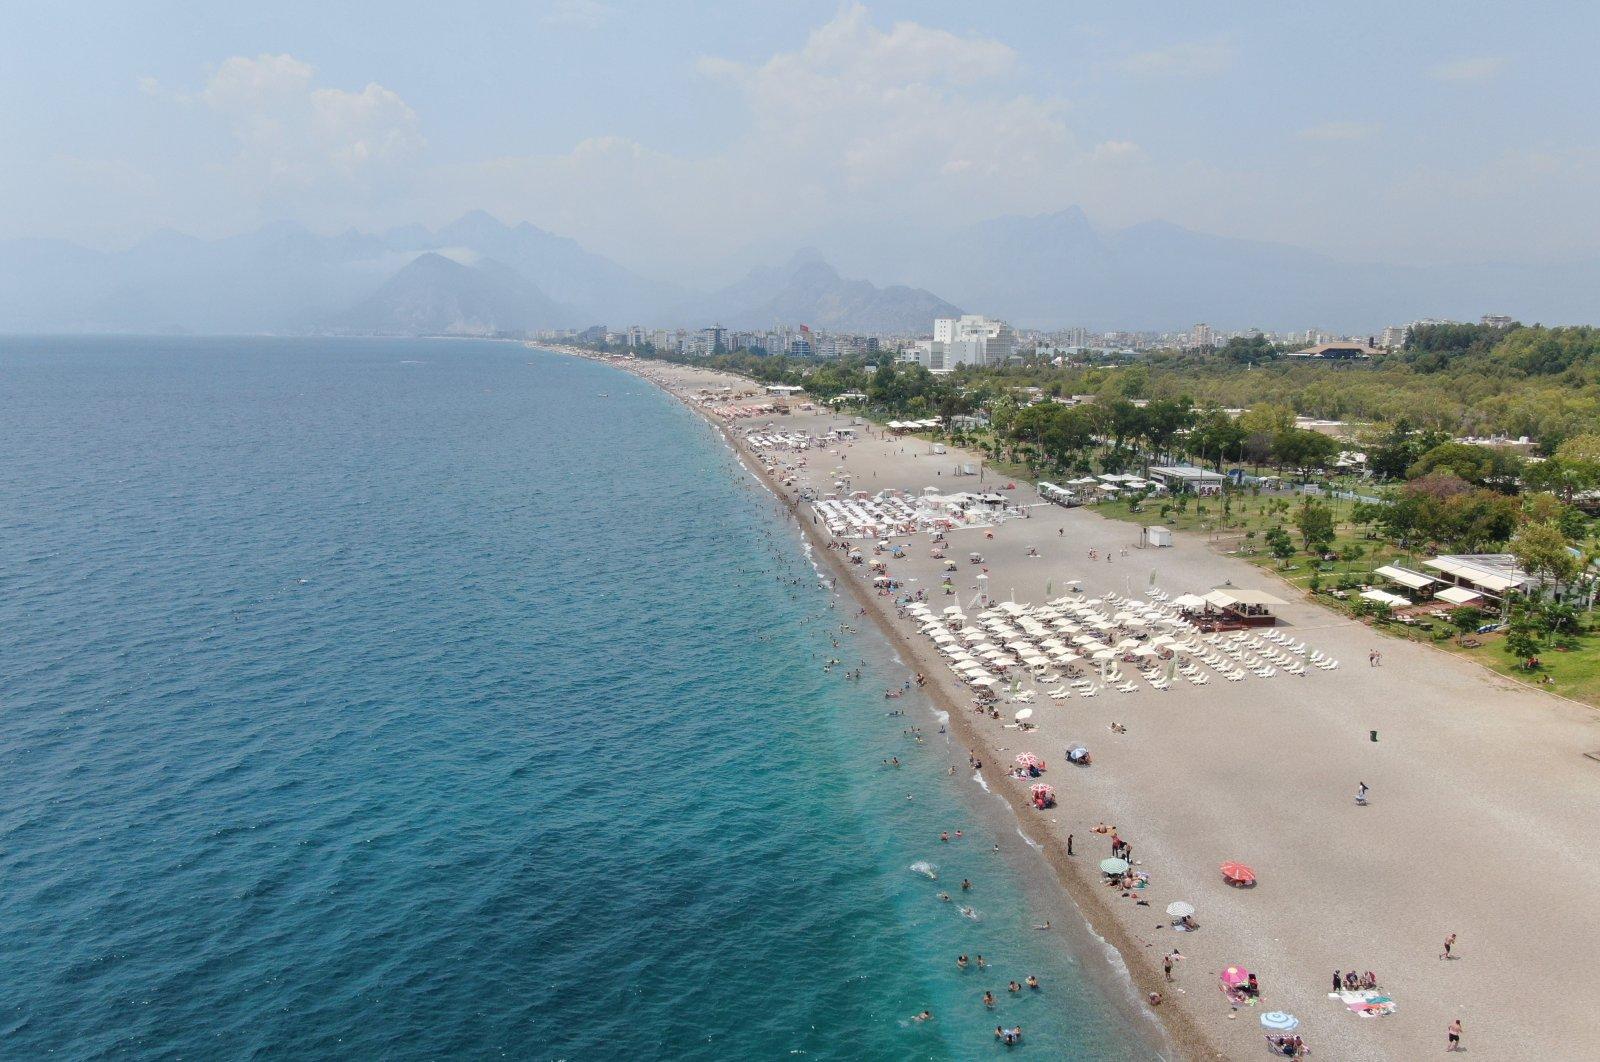 An aerial view of Konyaaltı beach in Antalya, southern Turkey, July 22, 2021. (IHA Photo)